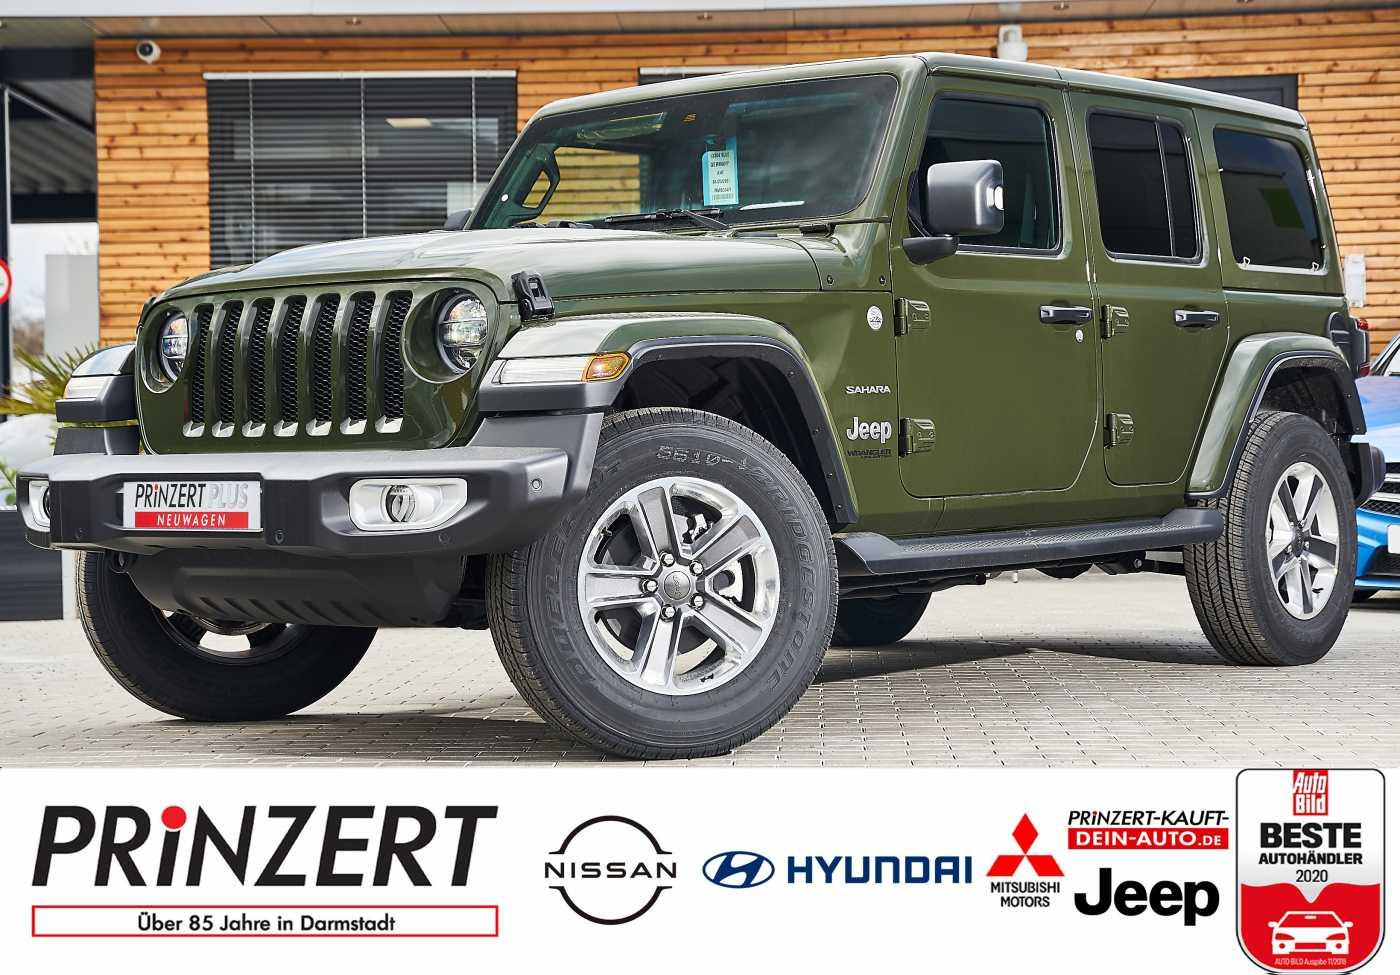 Jeep Wrangler ULTD MY21 2.0 8AT 4WD 'Sahara' Premium, Jahr 2021, Benzin